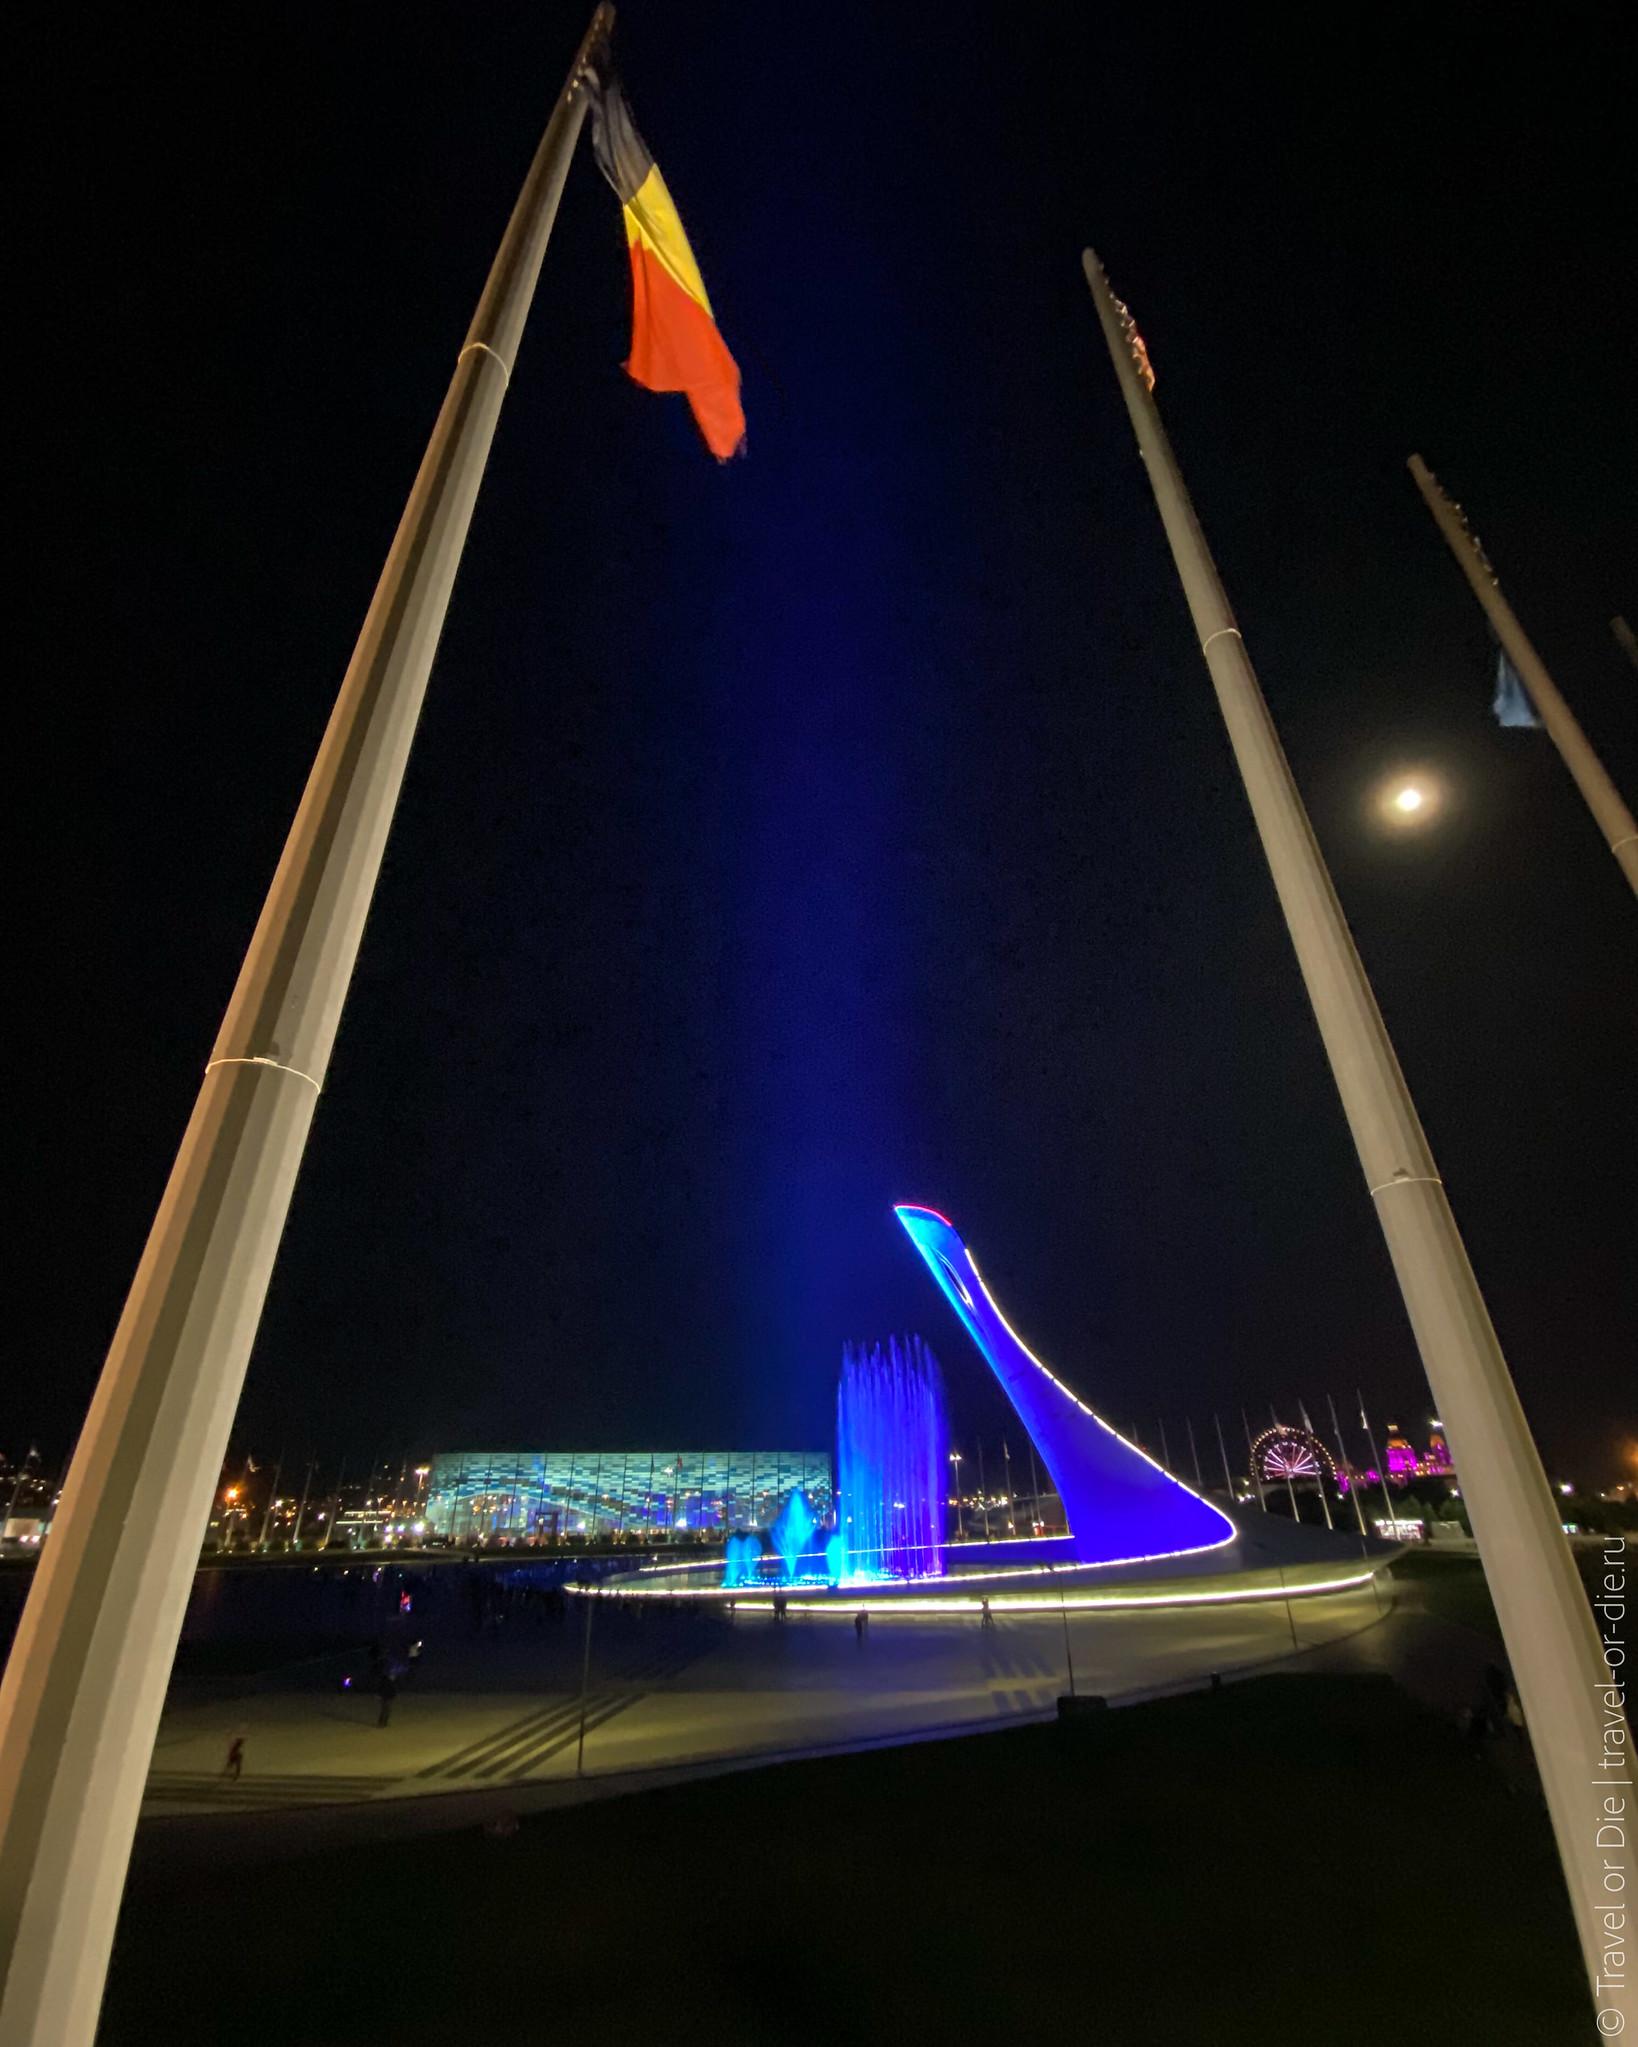 Singing-Fountain-Olympic-Park-Sochi-0897